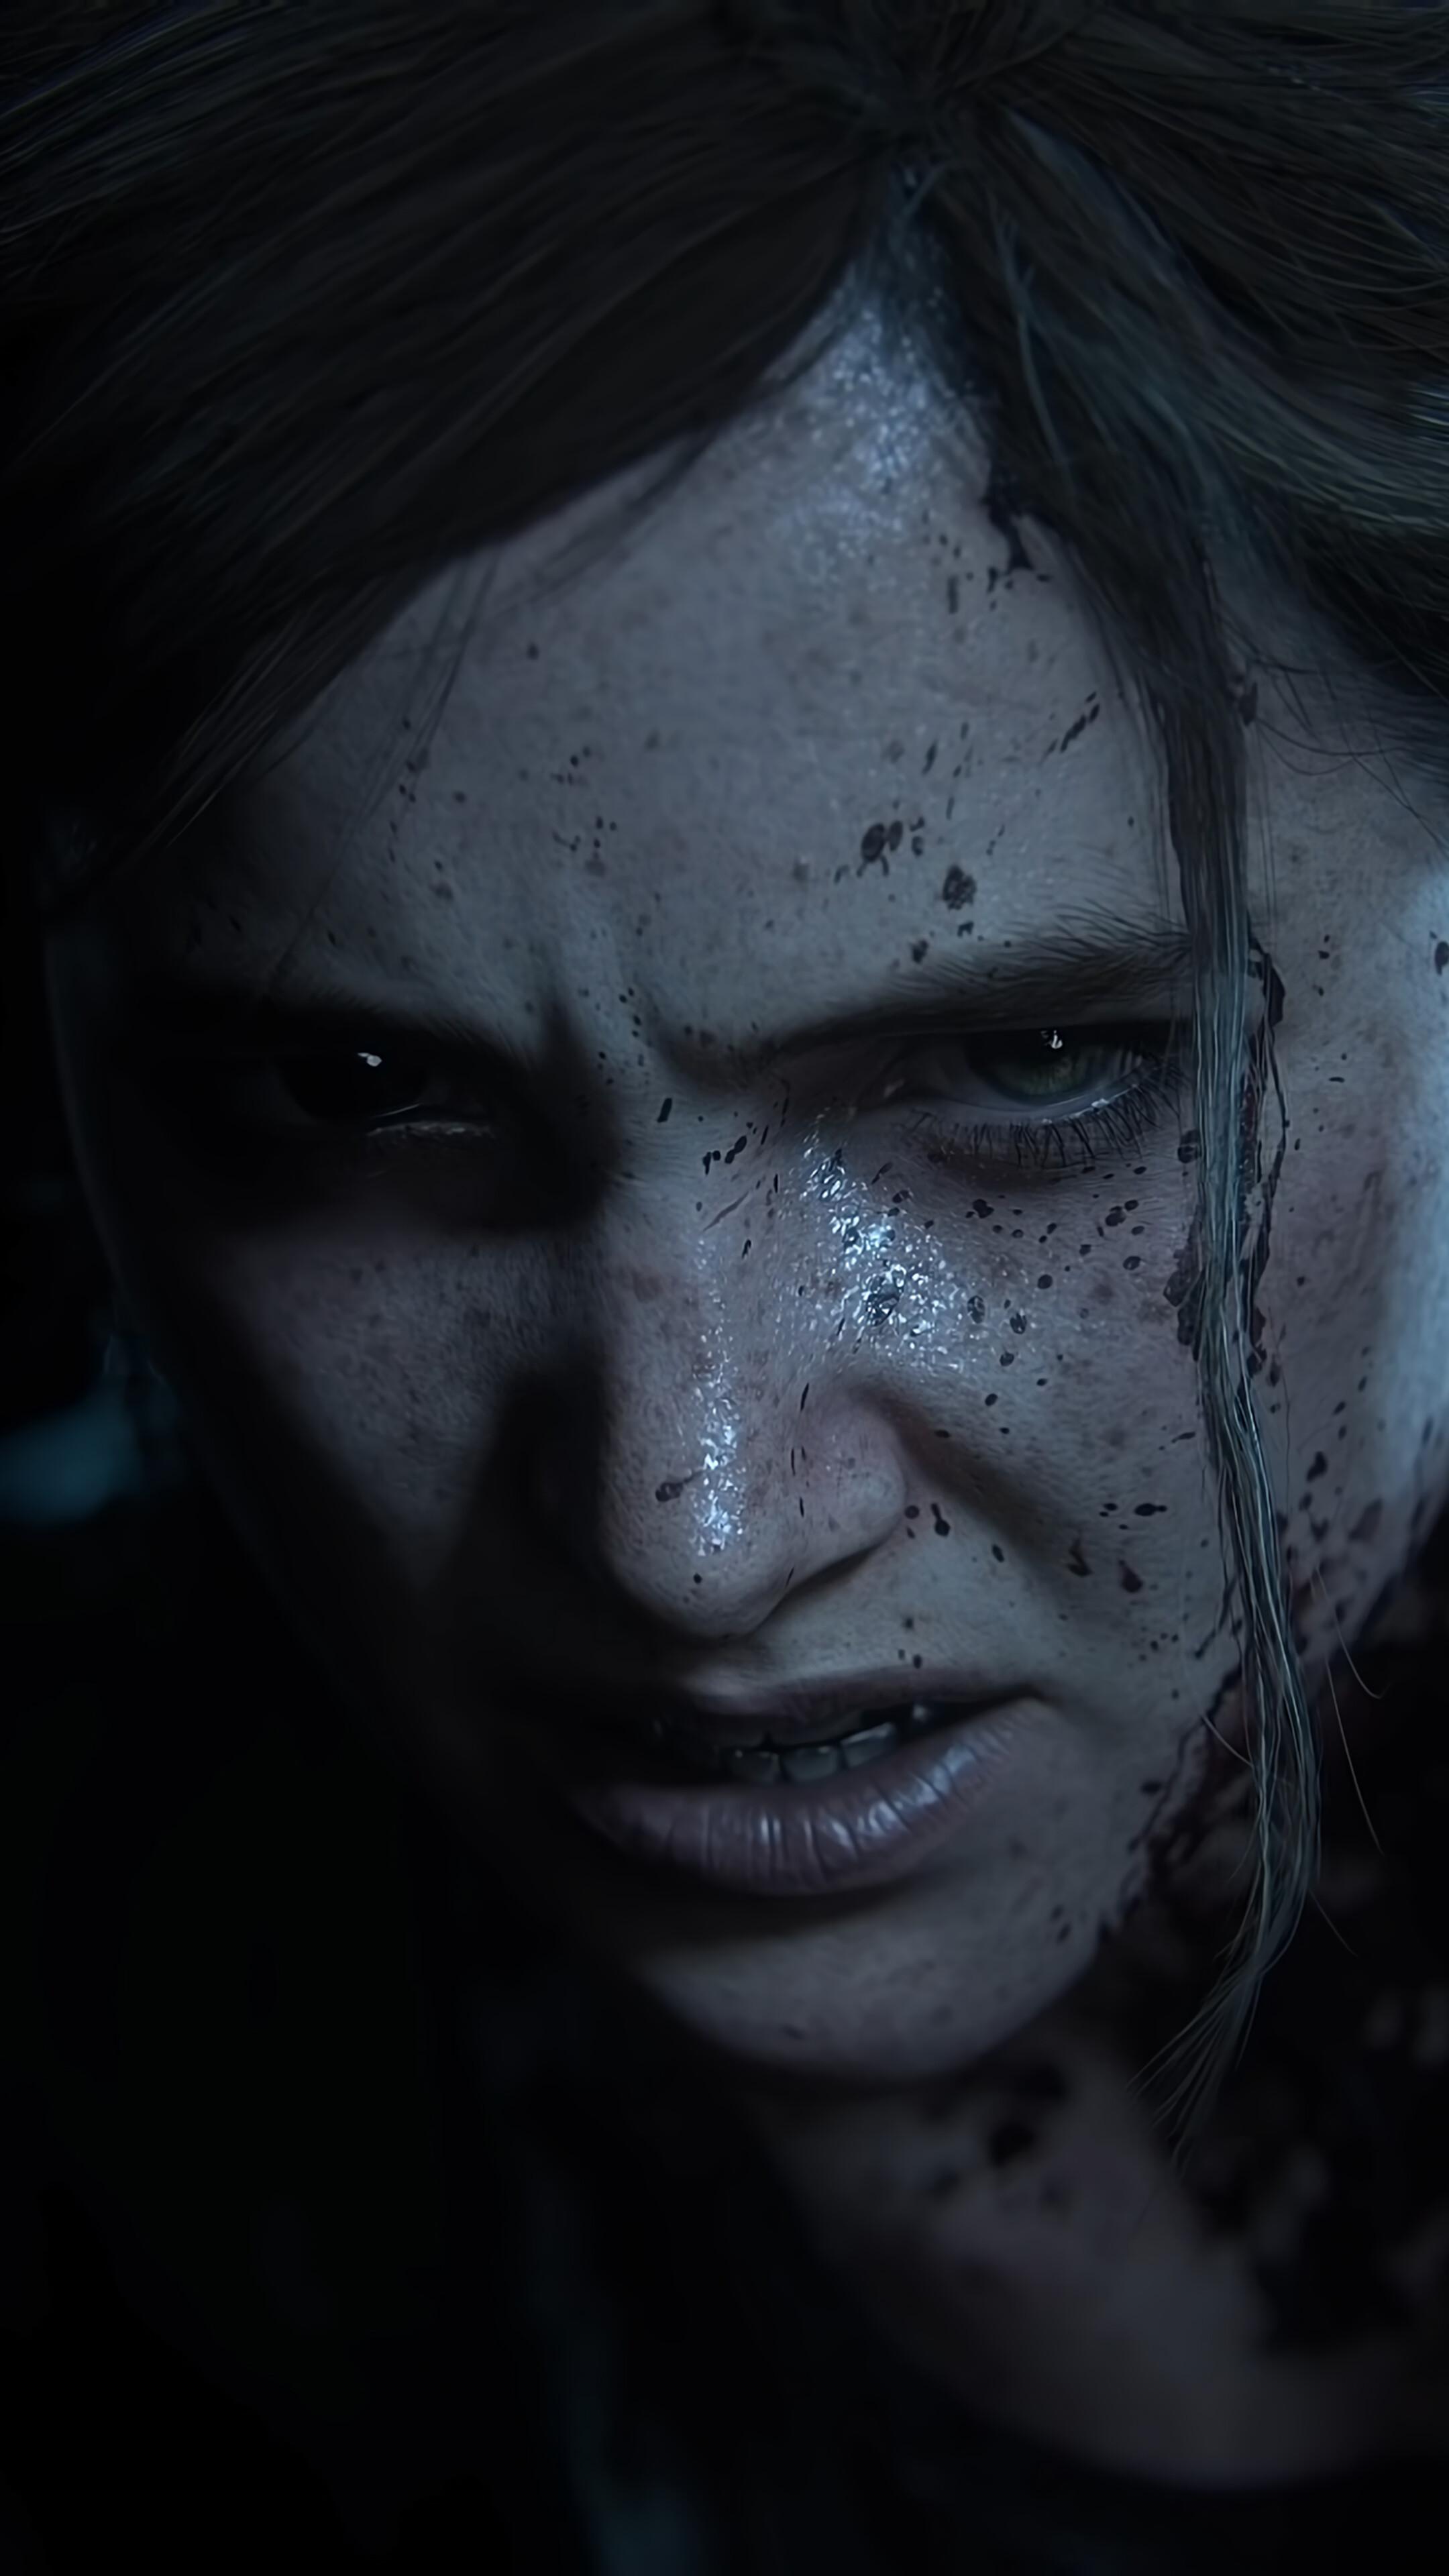 Ellie The Last of Us Part 2 4K Wallpaper 51372 2160x3840